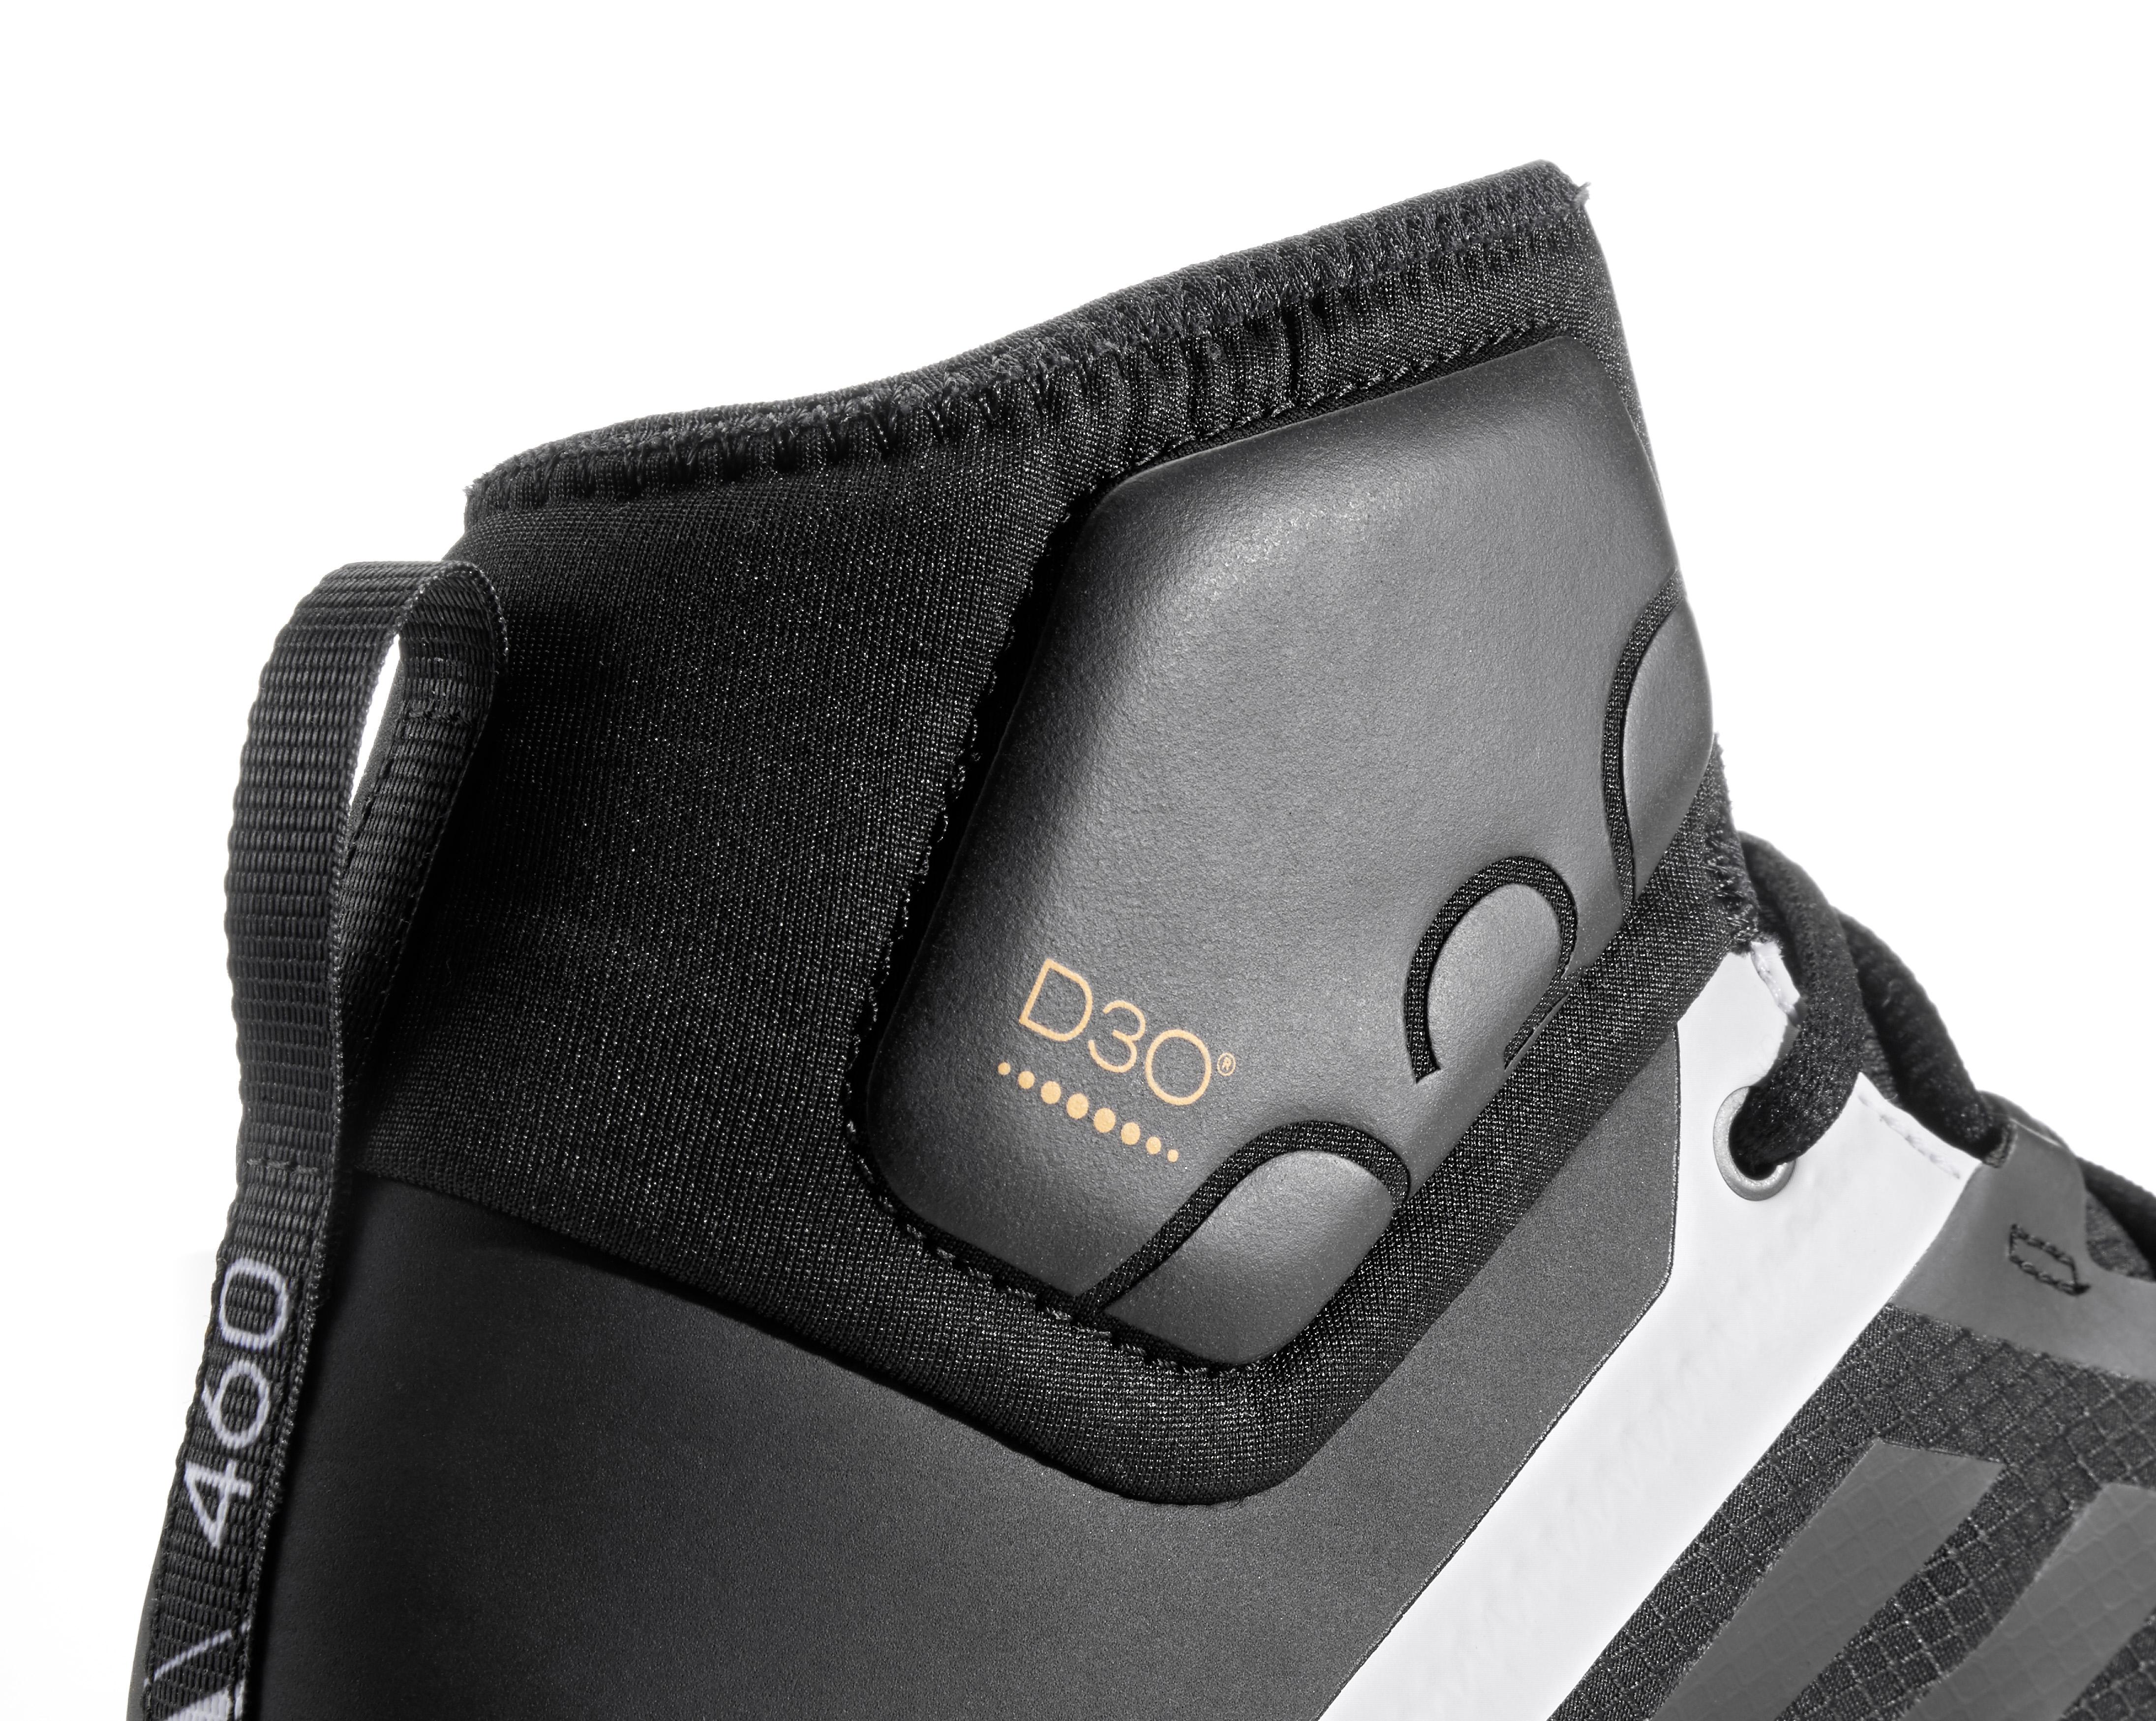 Adidas Terrex Trailcross Protect: Hohe Variante des Bike